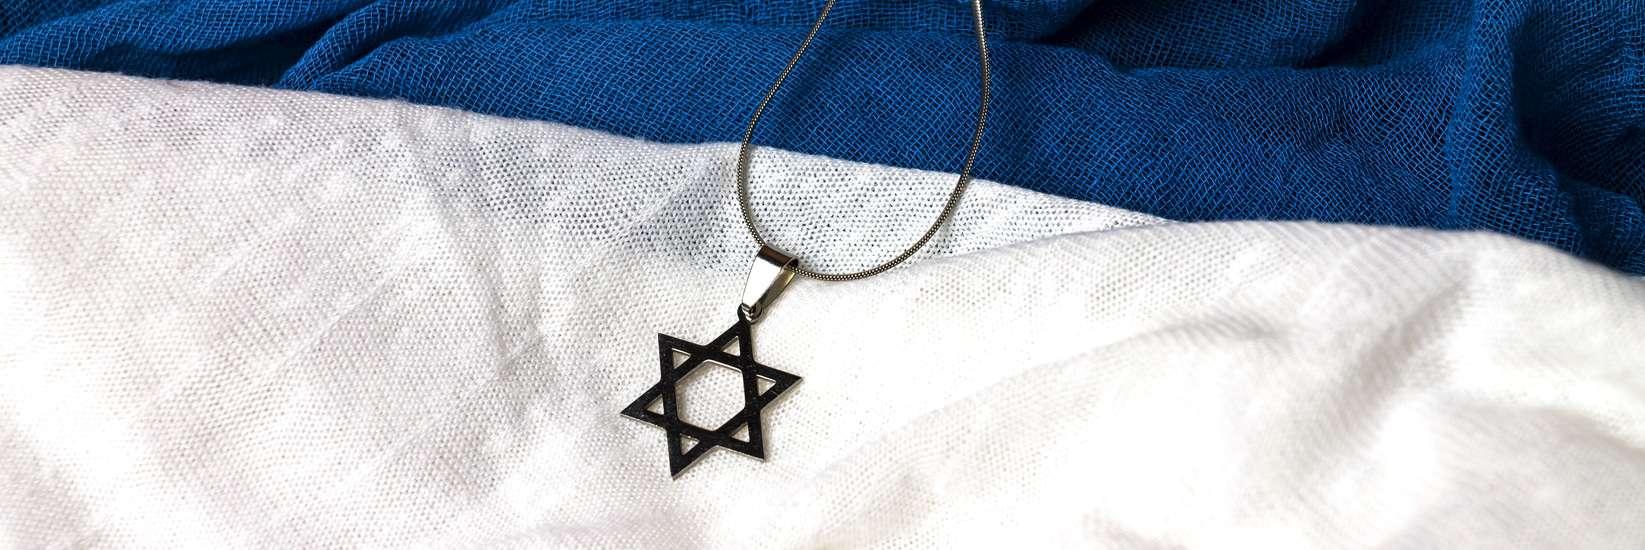 STAR OF DAVID JEWELRY